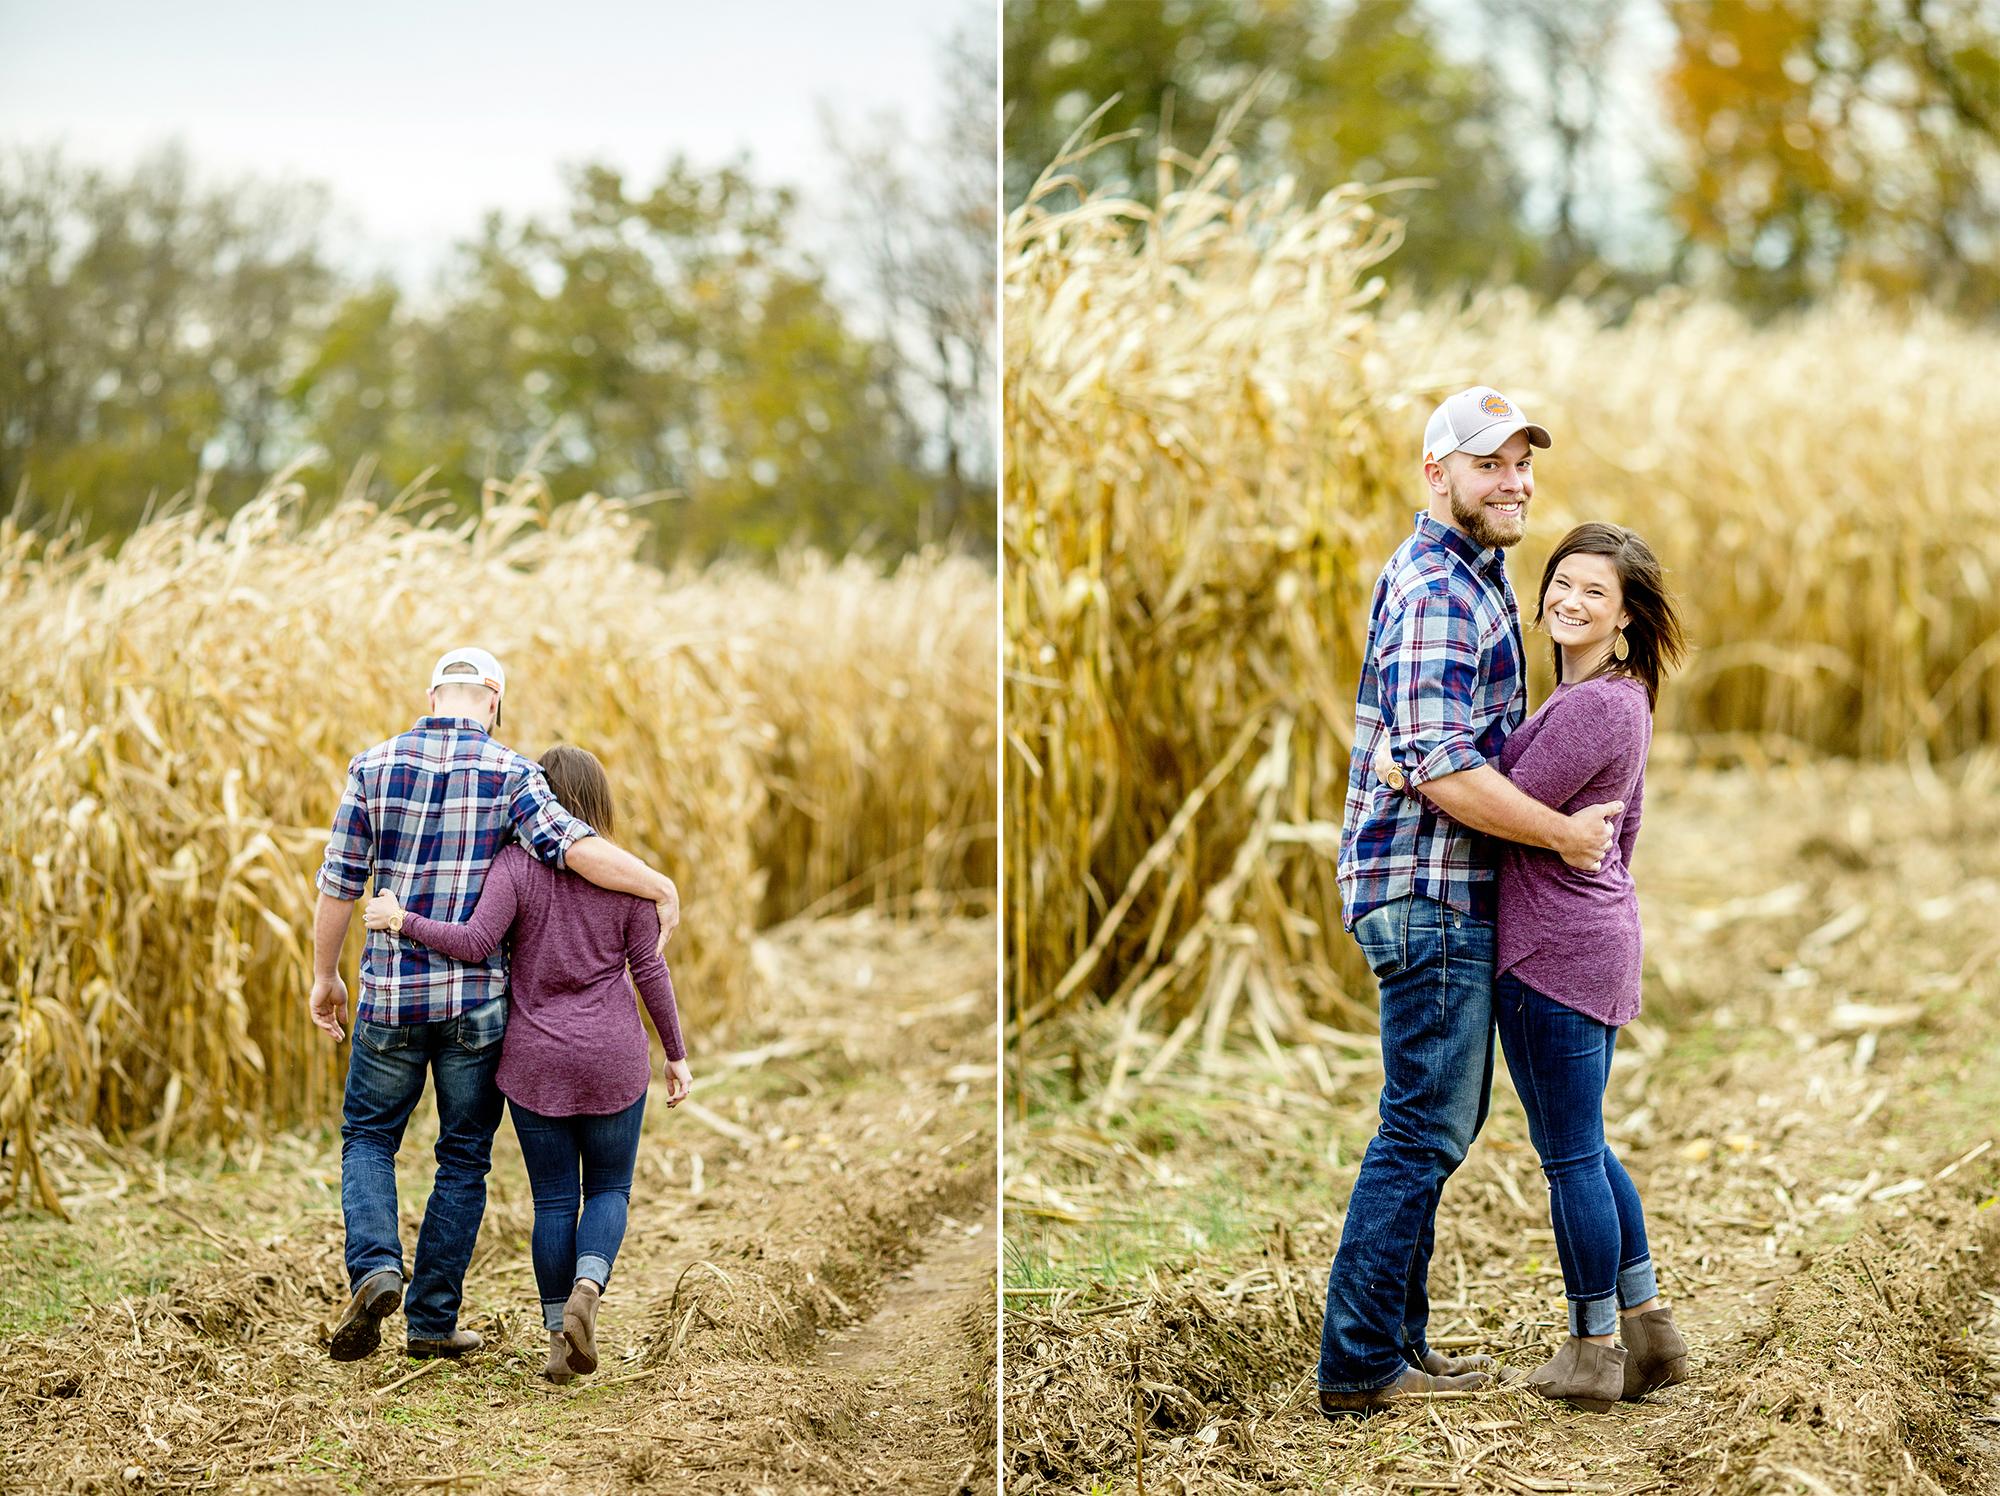 Seriously_Sabrina_Photography_Lexington_Kentucky_Country_Roads_Eckert_Boyd_Pisgah_Keeneland_Engagement_SethRachel_9.jpg